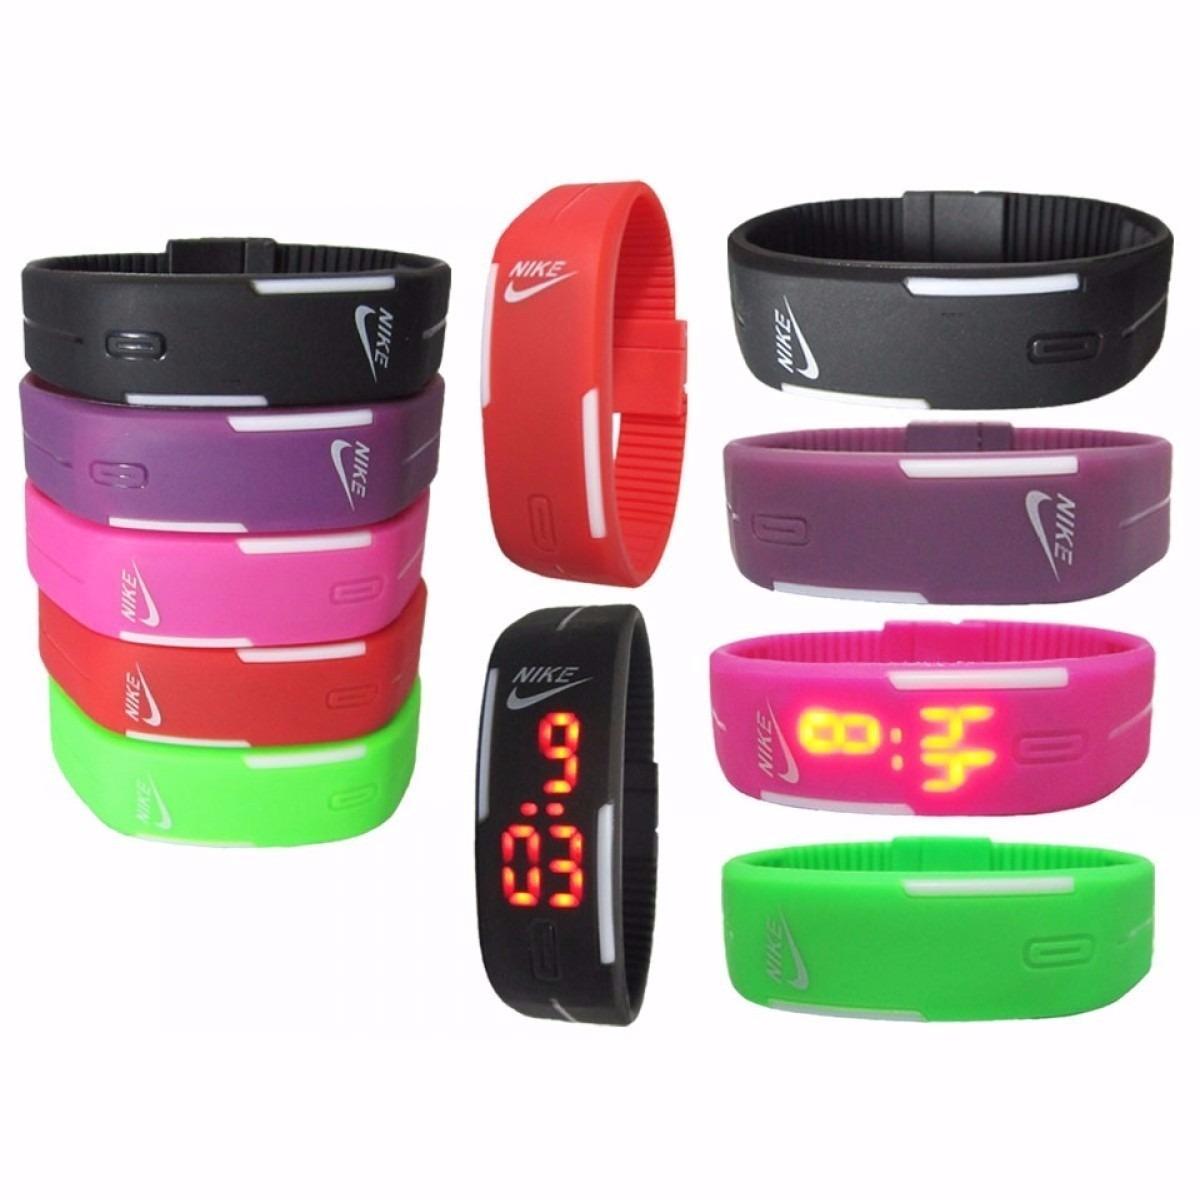 4c85dd0b050  relógio led digital sport nike pulseira silicone bracelete . Carregando  zoom.